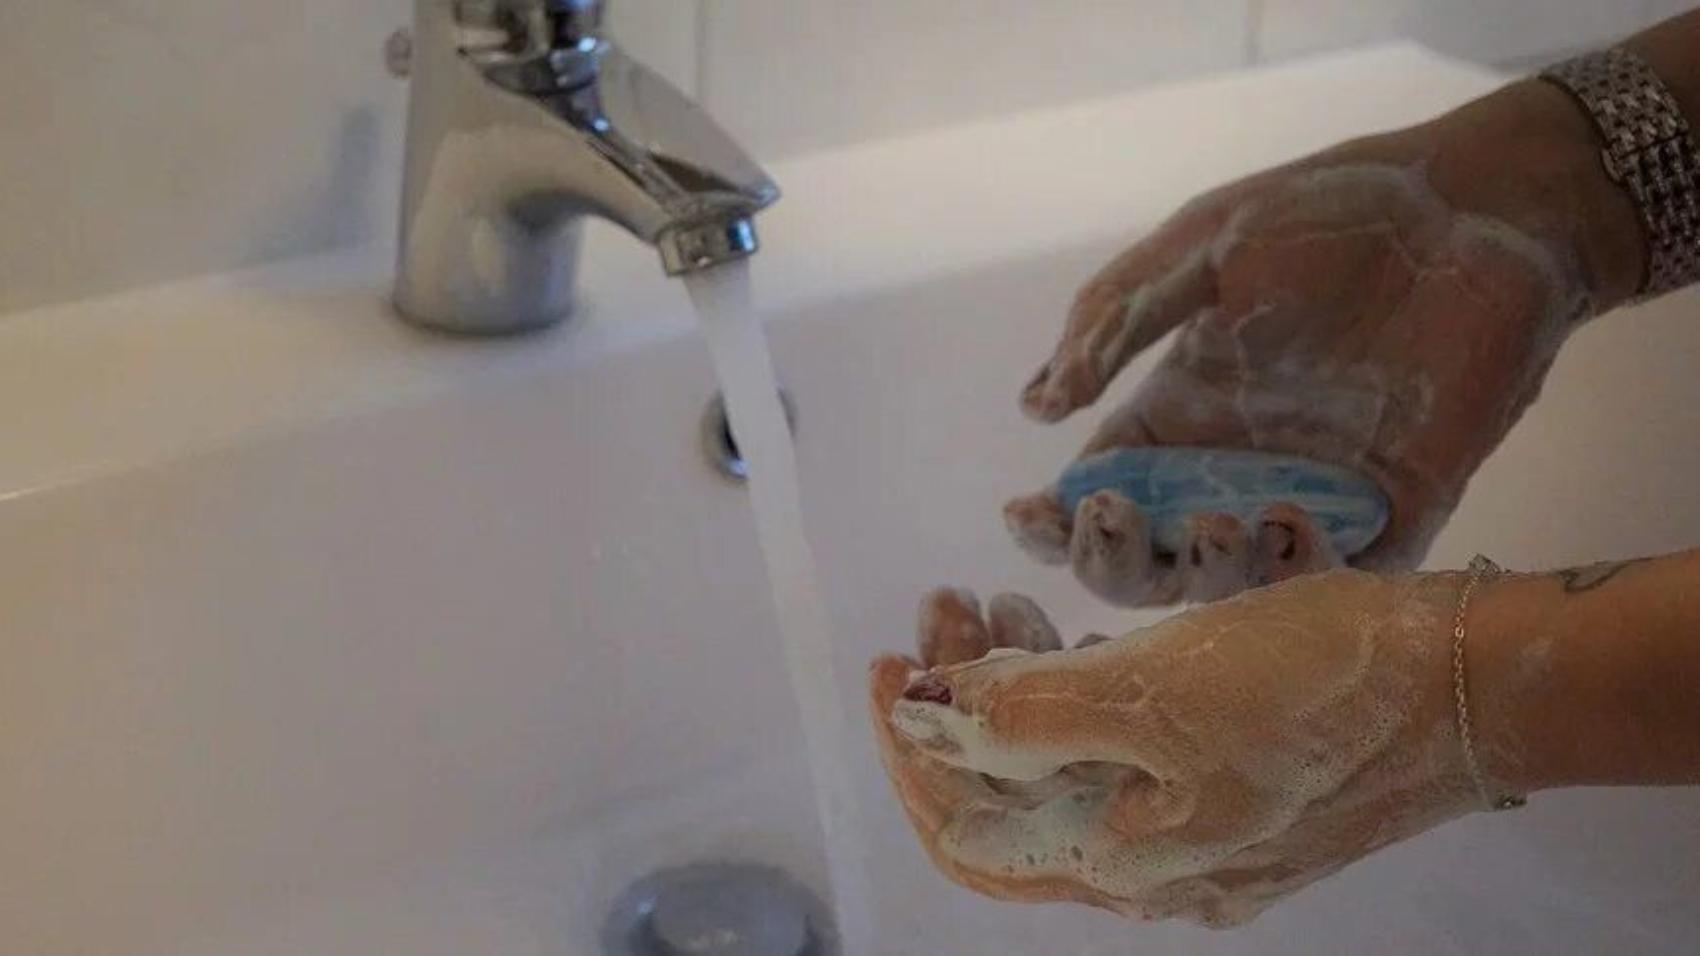 wash-hands-4925790_960_720